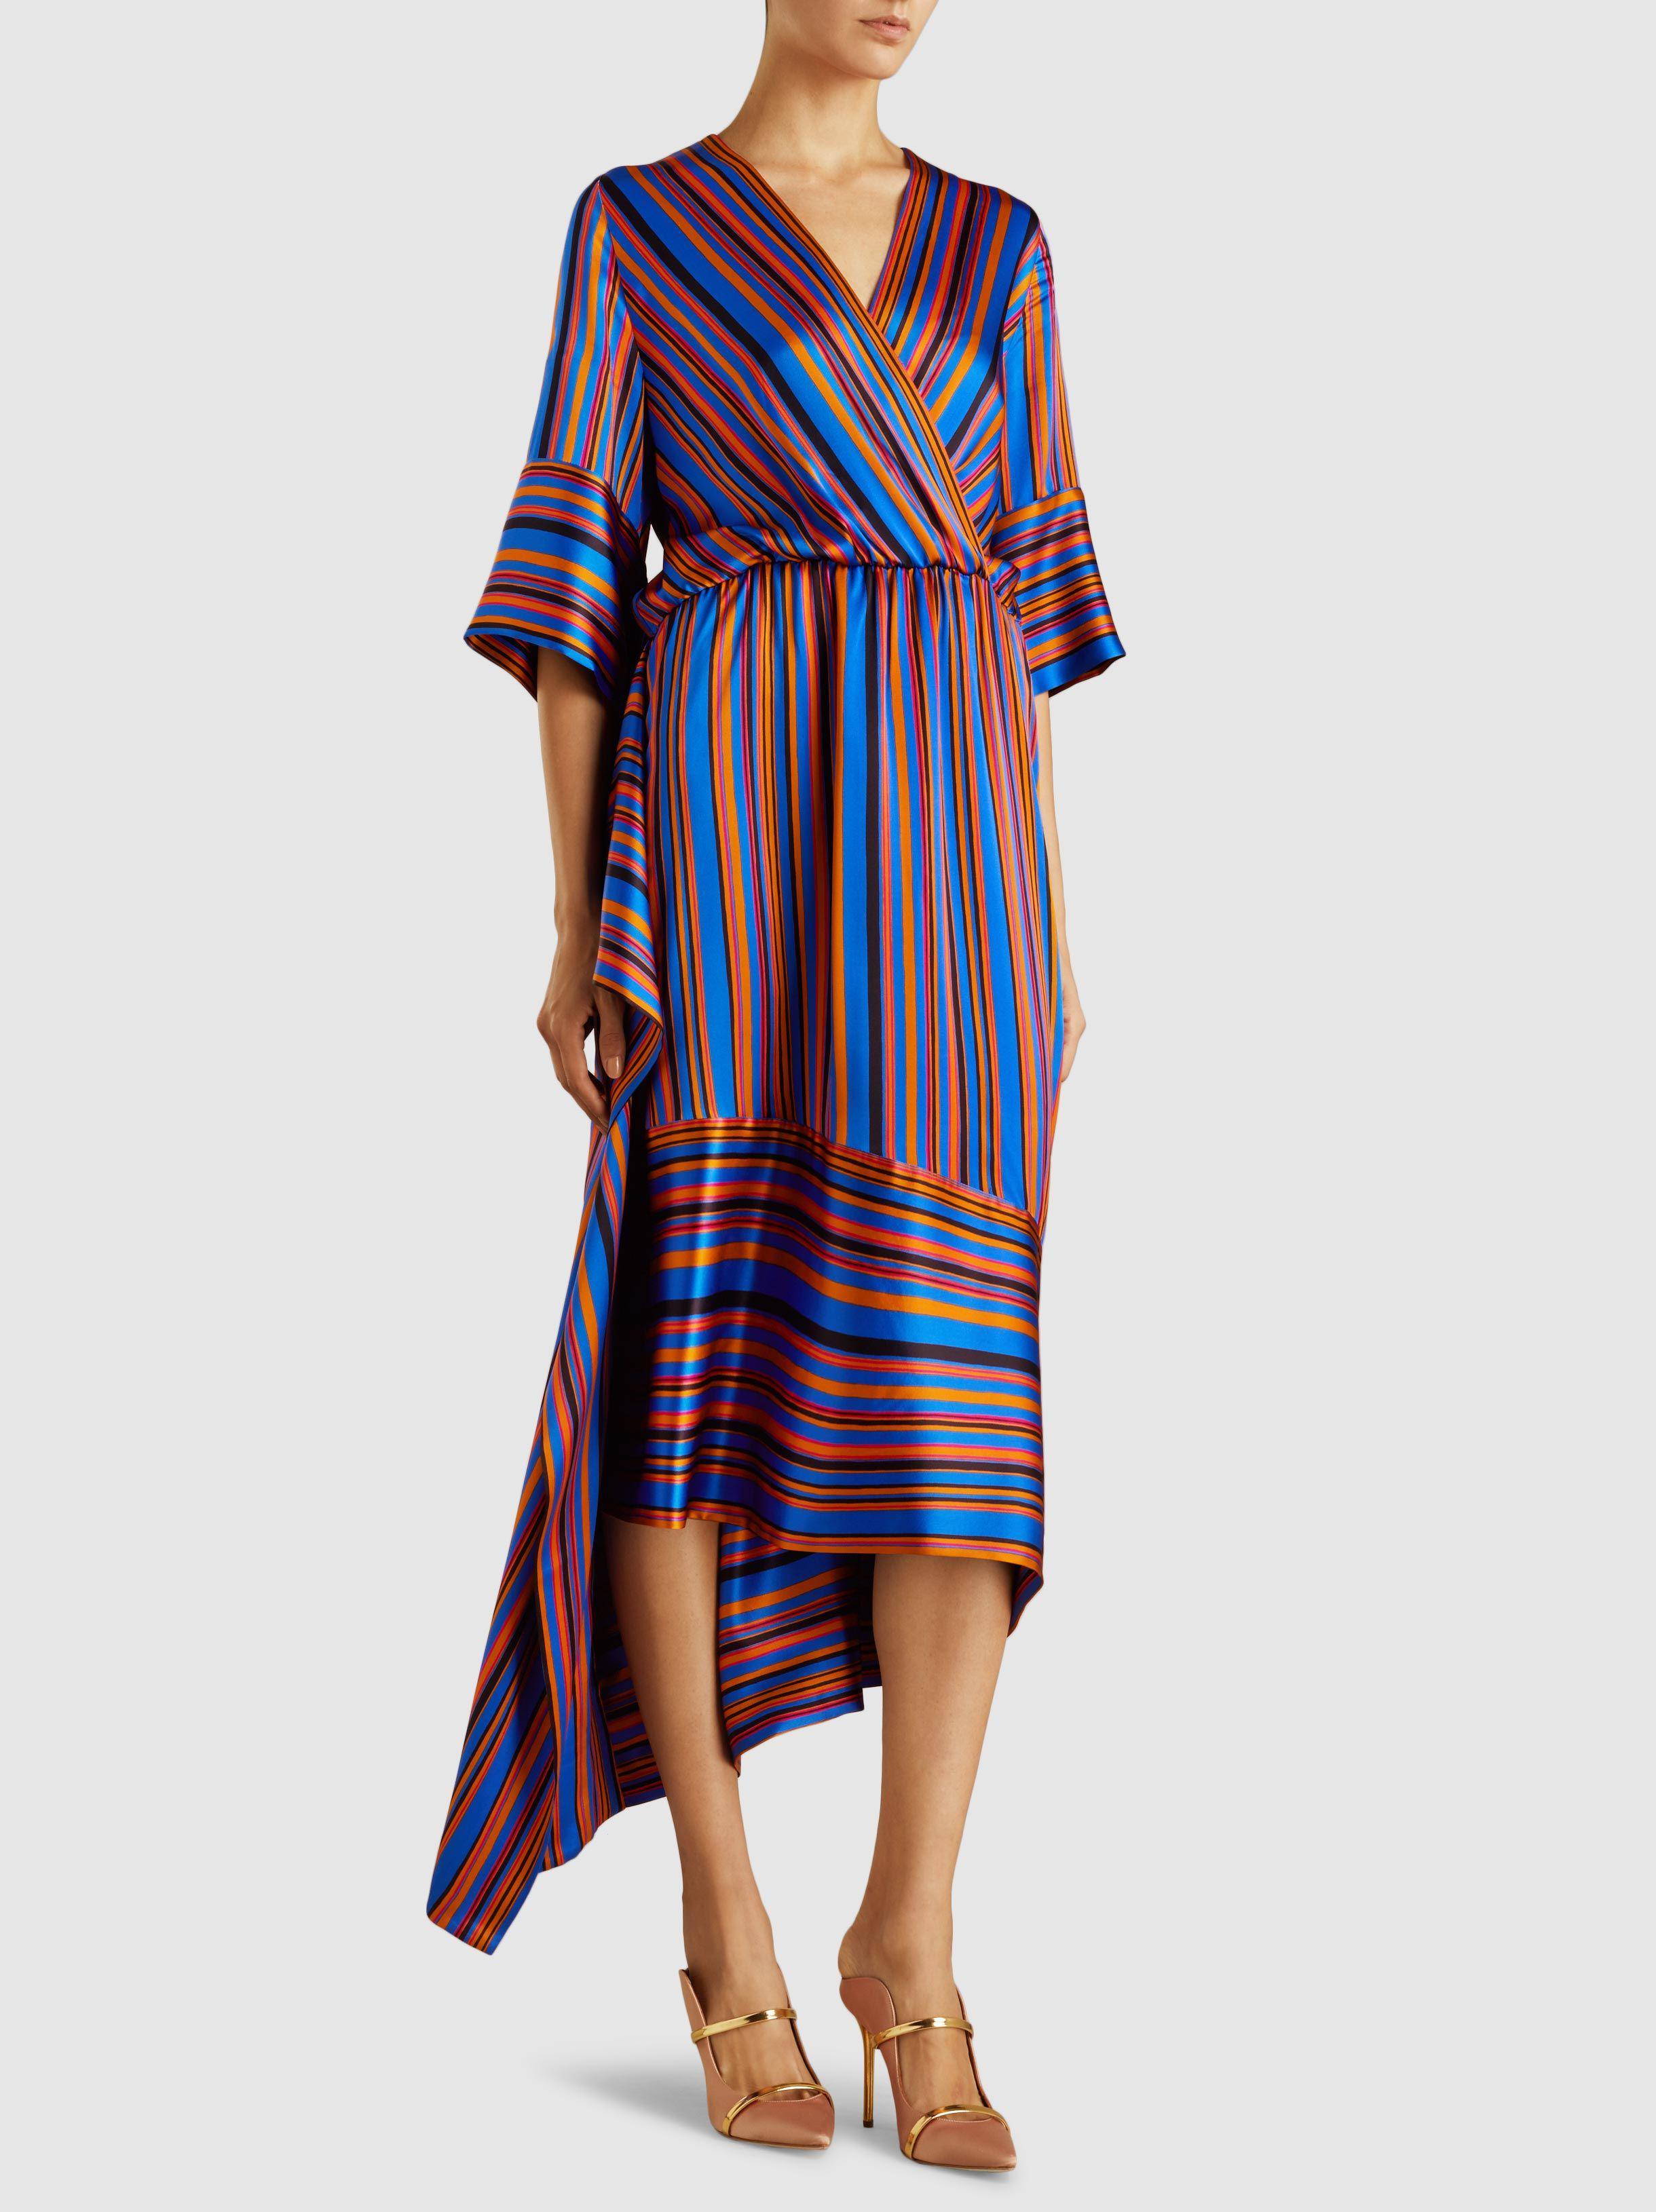 Danu striped dress - Blue Petar Petrov Gw3mfh